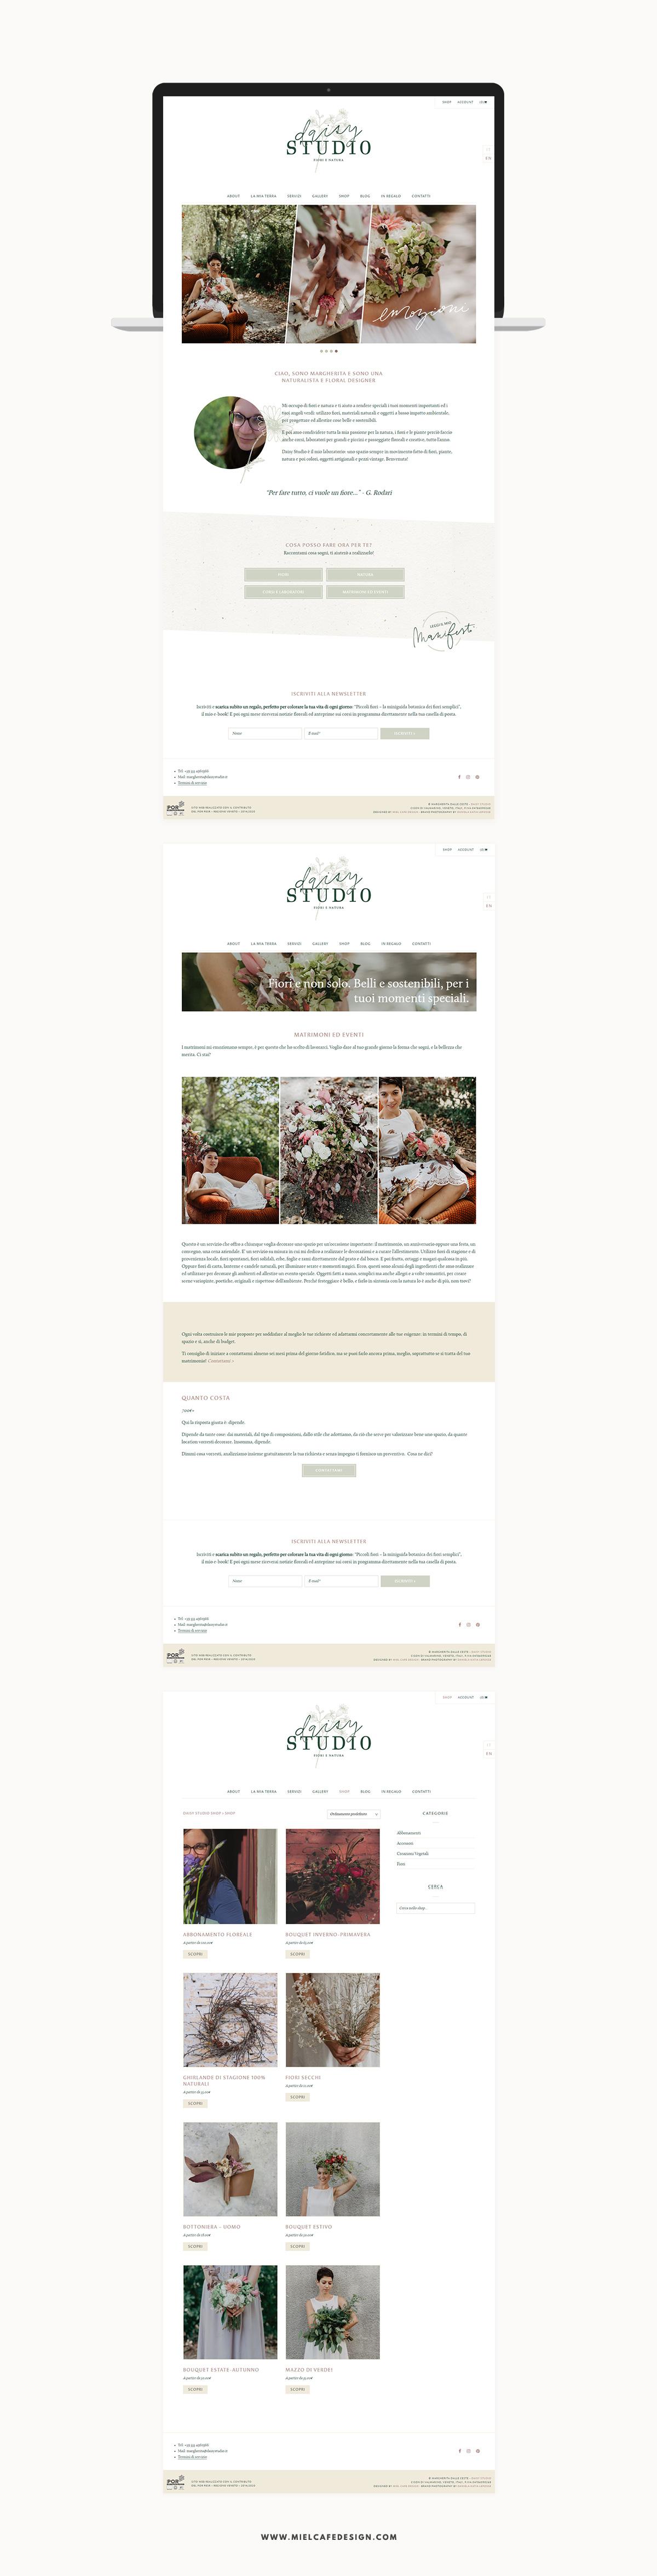 Rebranding For Floral Designer Daisy Studio Web Design Website Shop Preview